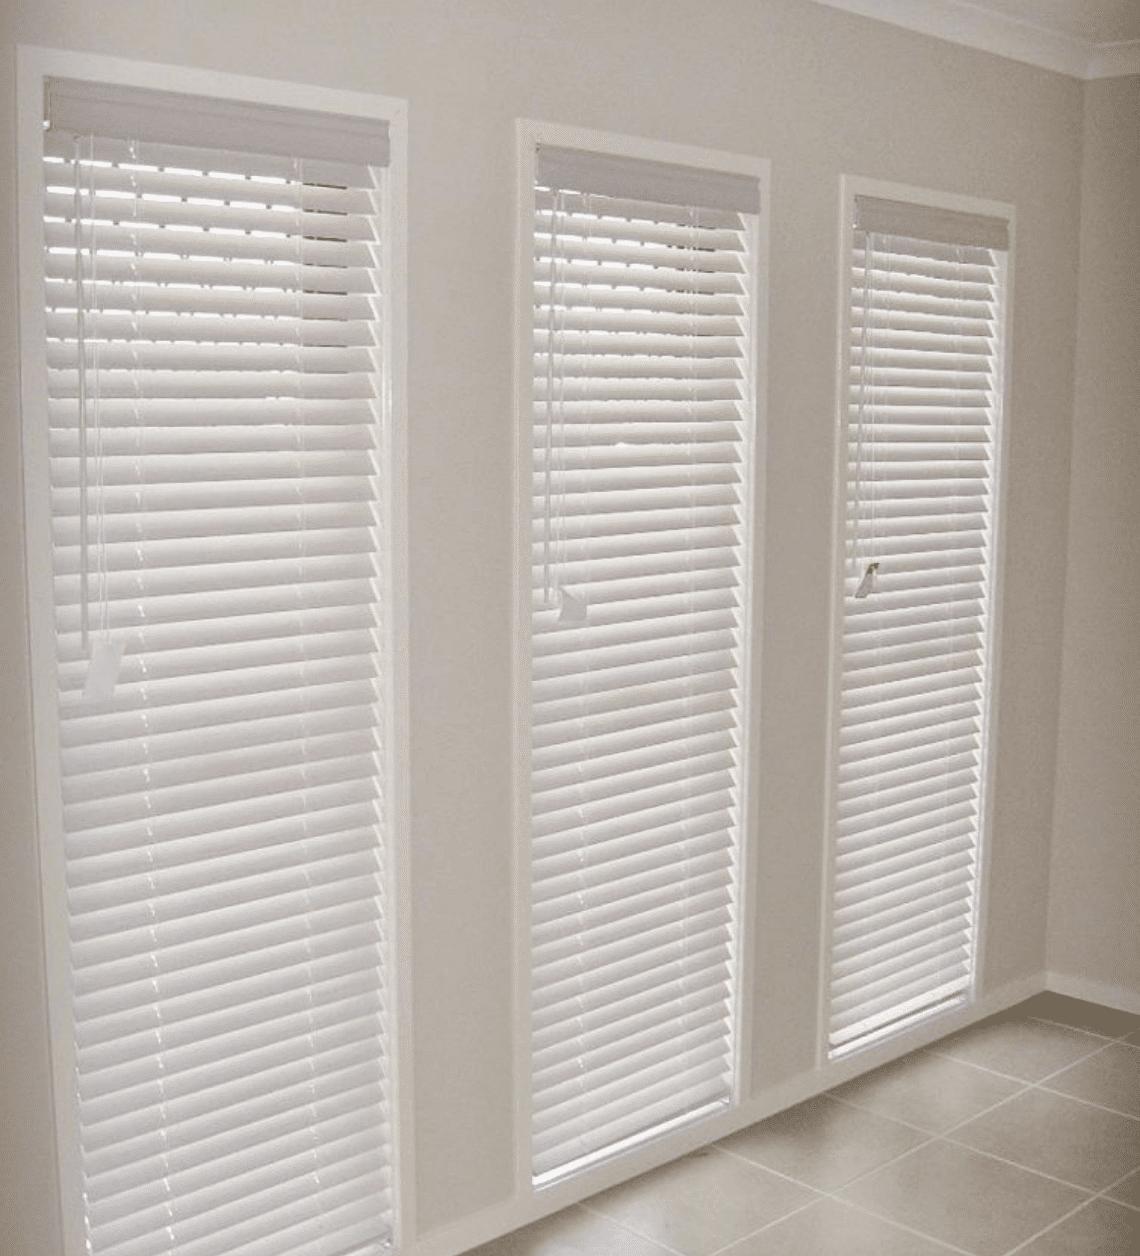 venetian blinds,venetian blinds sydney,venetian blinds central coast - Venetian Blinds